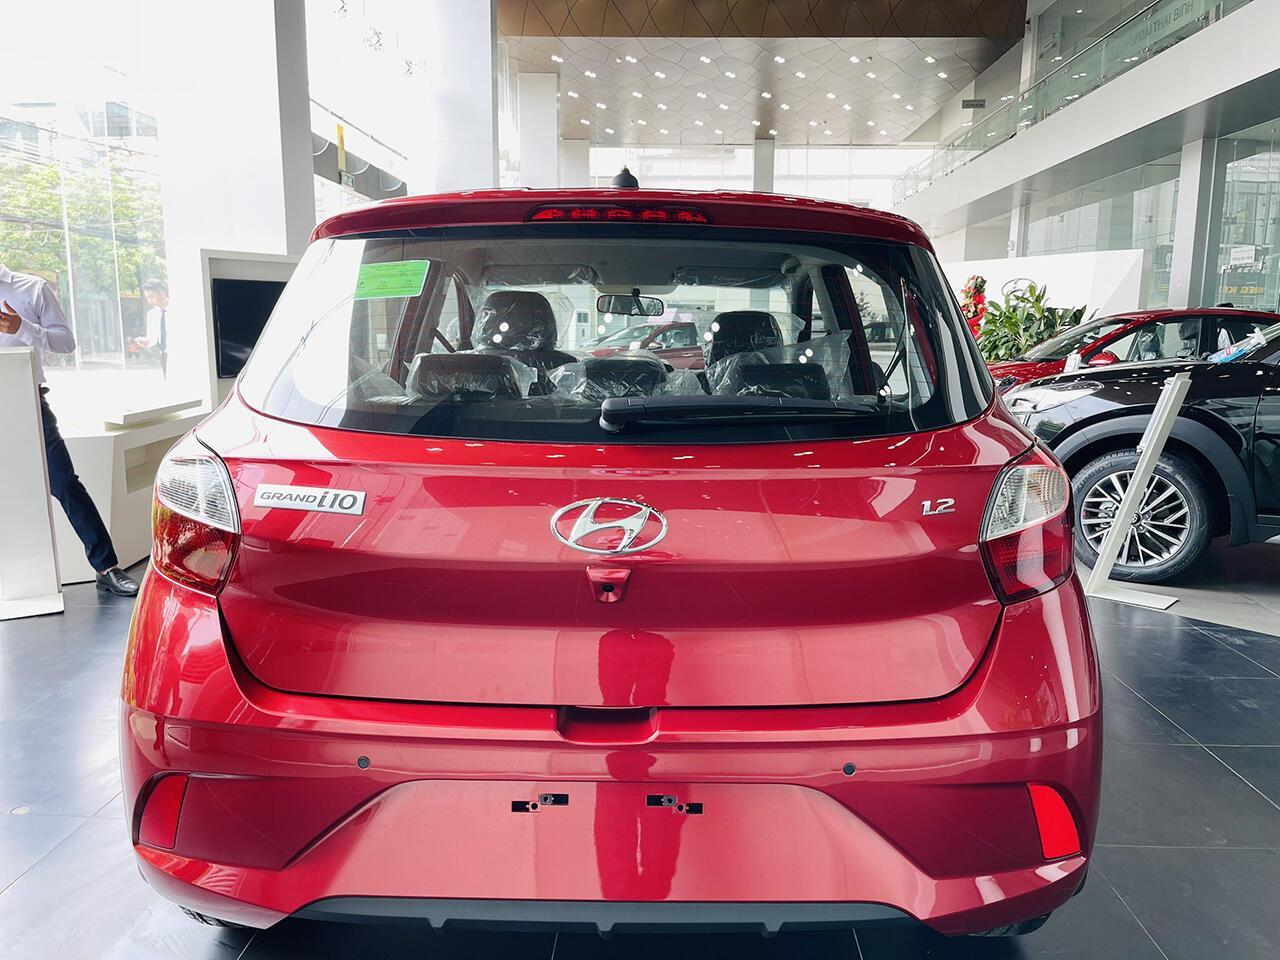 Hyundai Grand I10 Hatchback 1.2 MT Tiêu chuẩn 2021